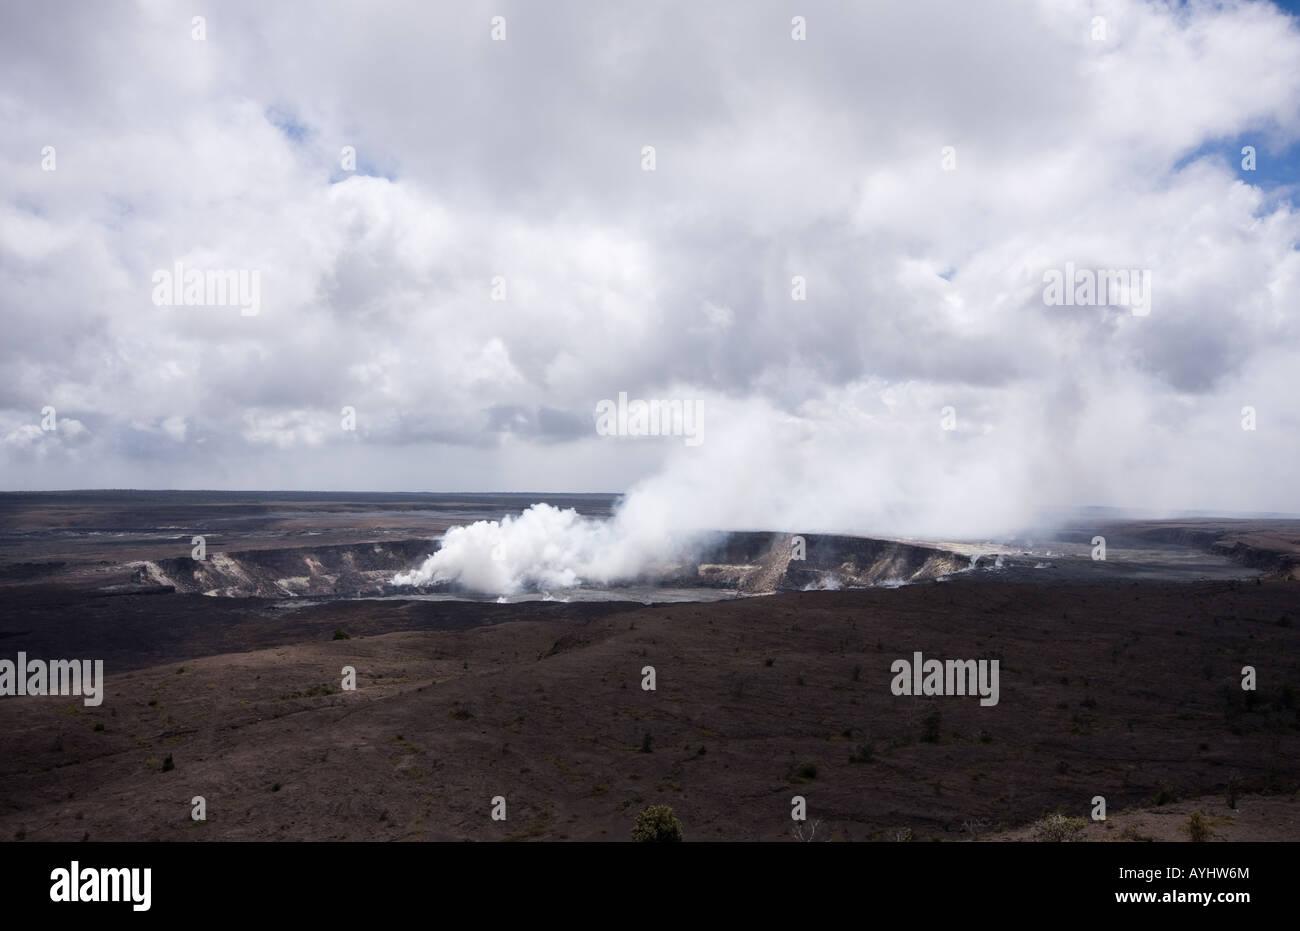 Halema'uma'u Crater on the Kilauea Caldera at Hawaii Volcanoes National Park, Island of Hawaii, United States - Stock Image